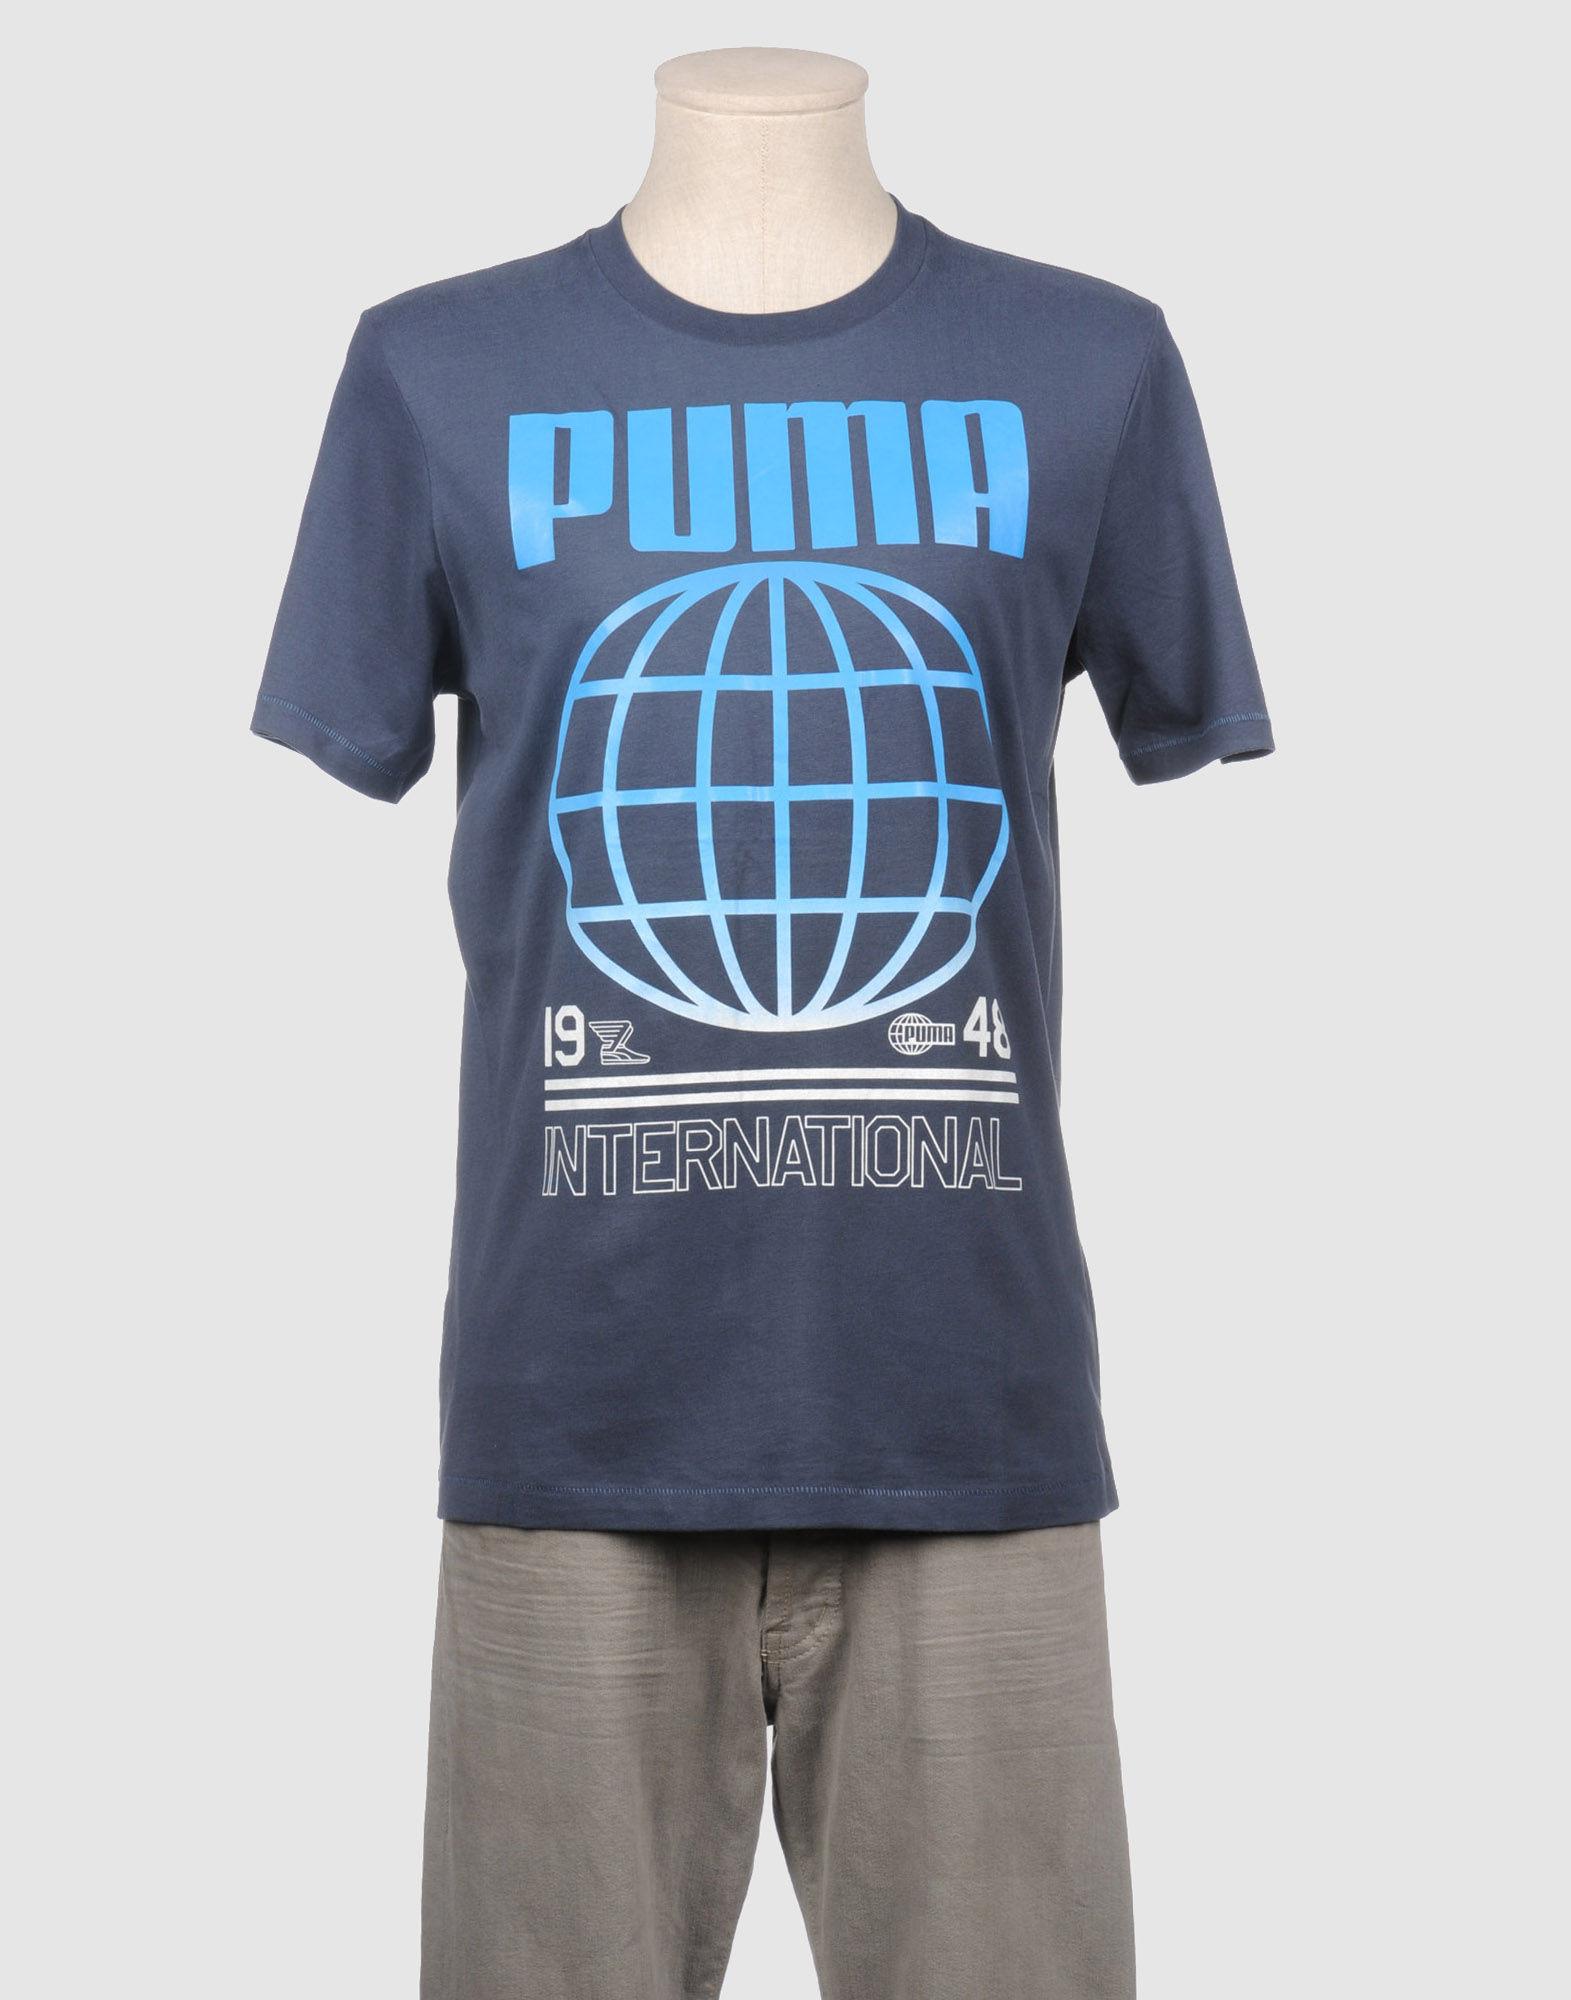 Puma Short Sleeve T-shirt in Blue for Men